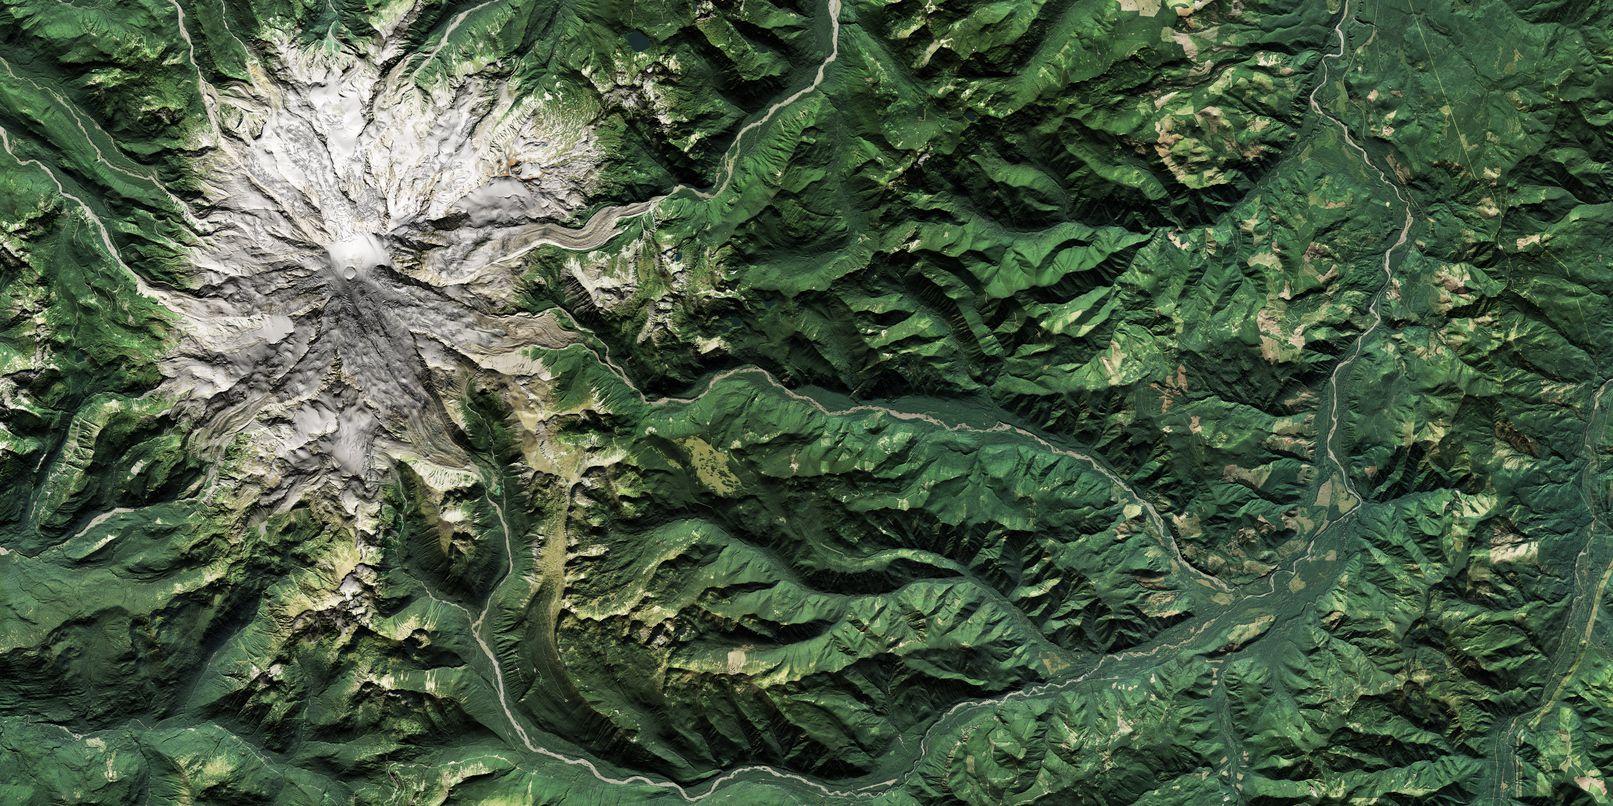 Map of Mount Rainier (Natural Color)